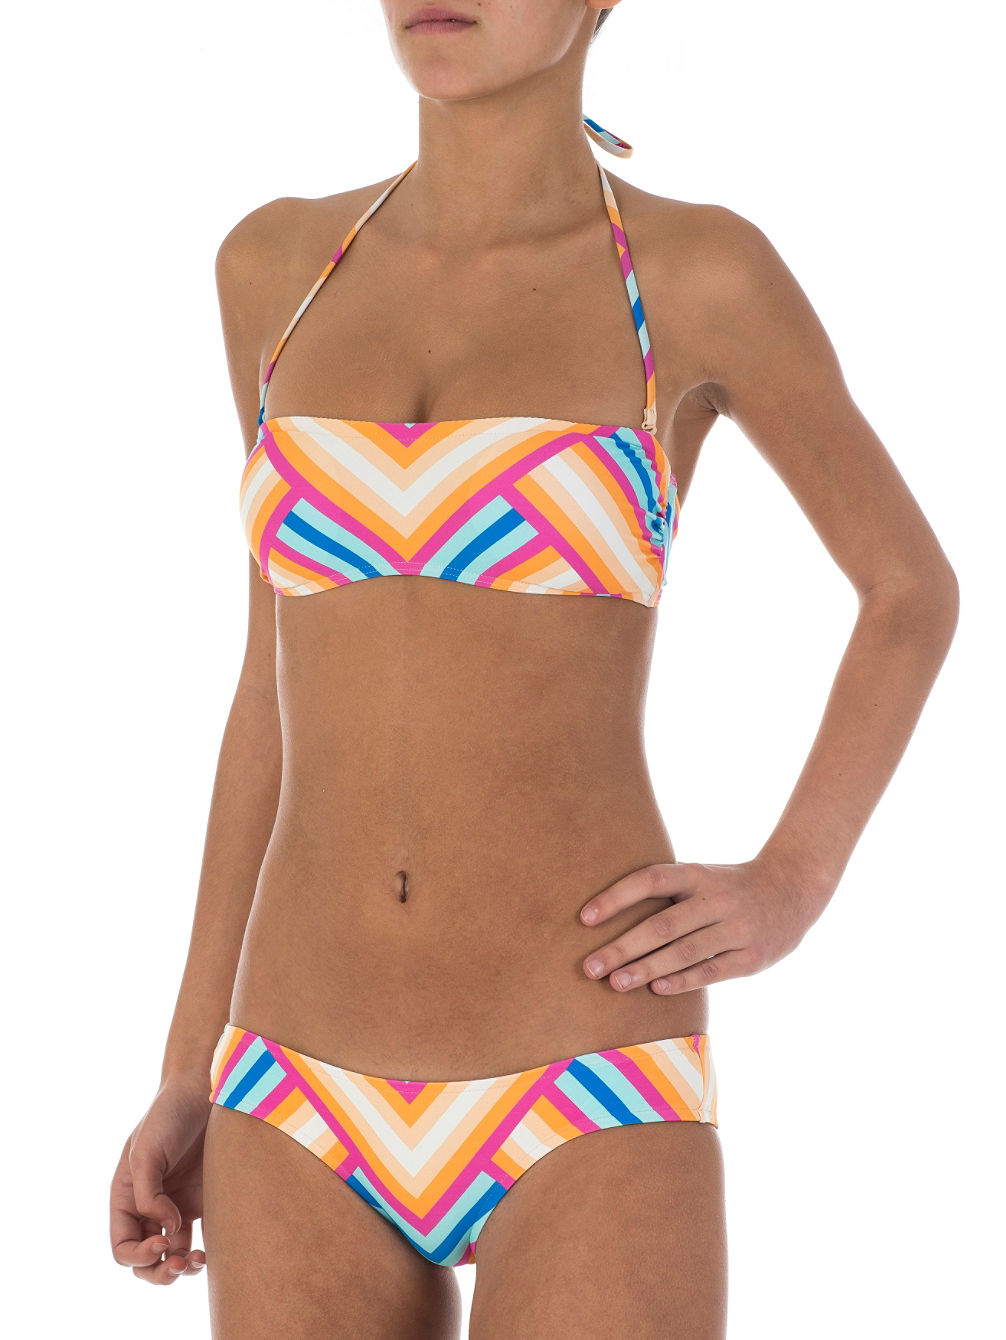 Buy Rip Curl Summer Haze Top Bikini online at blue-tomato.com